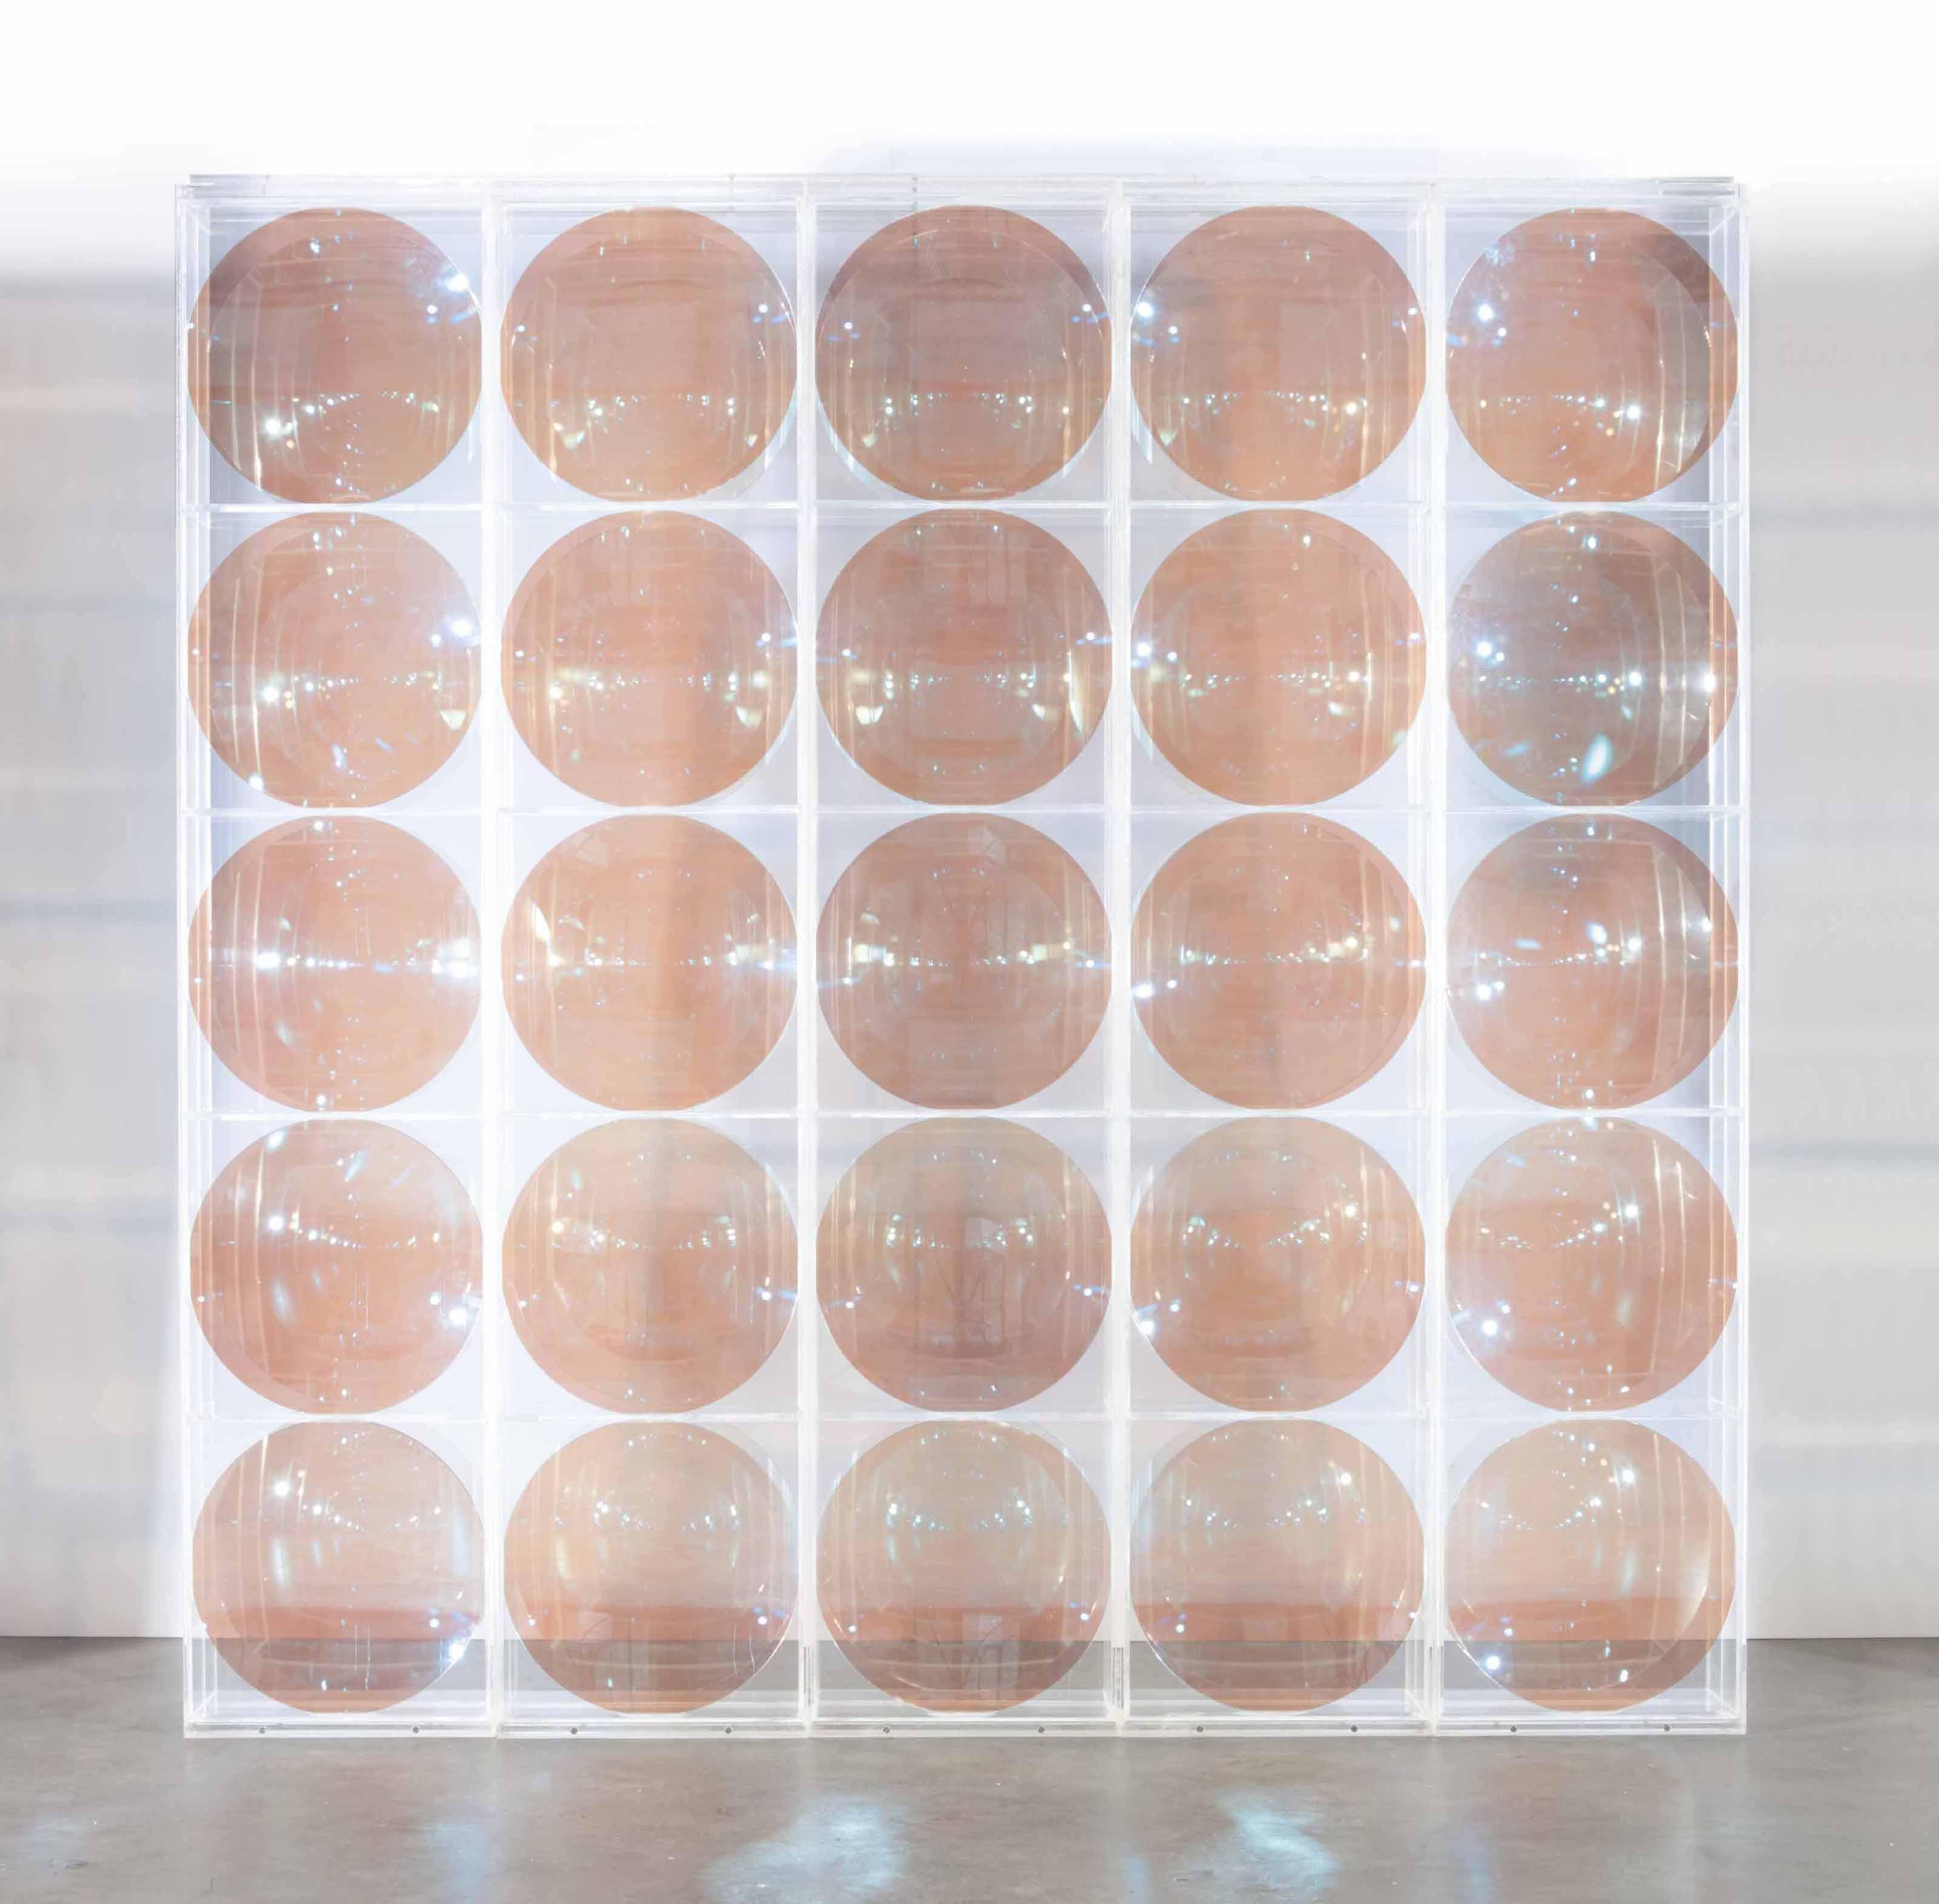 Integration, Sphärische Hohlspiegelwand (Integration, Spherical Concave Mirror Wall)